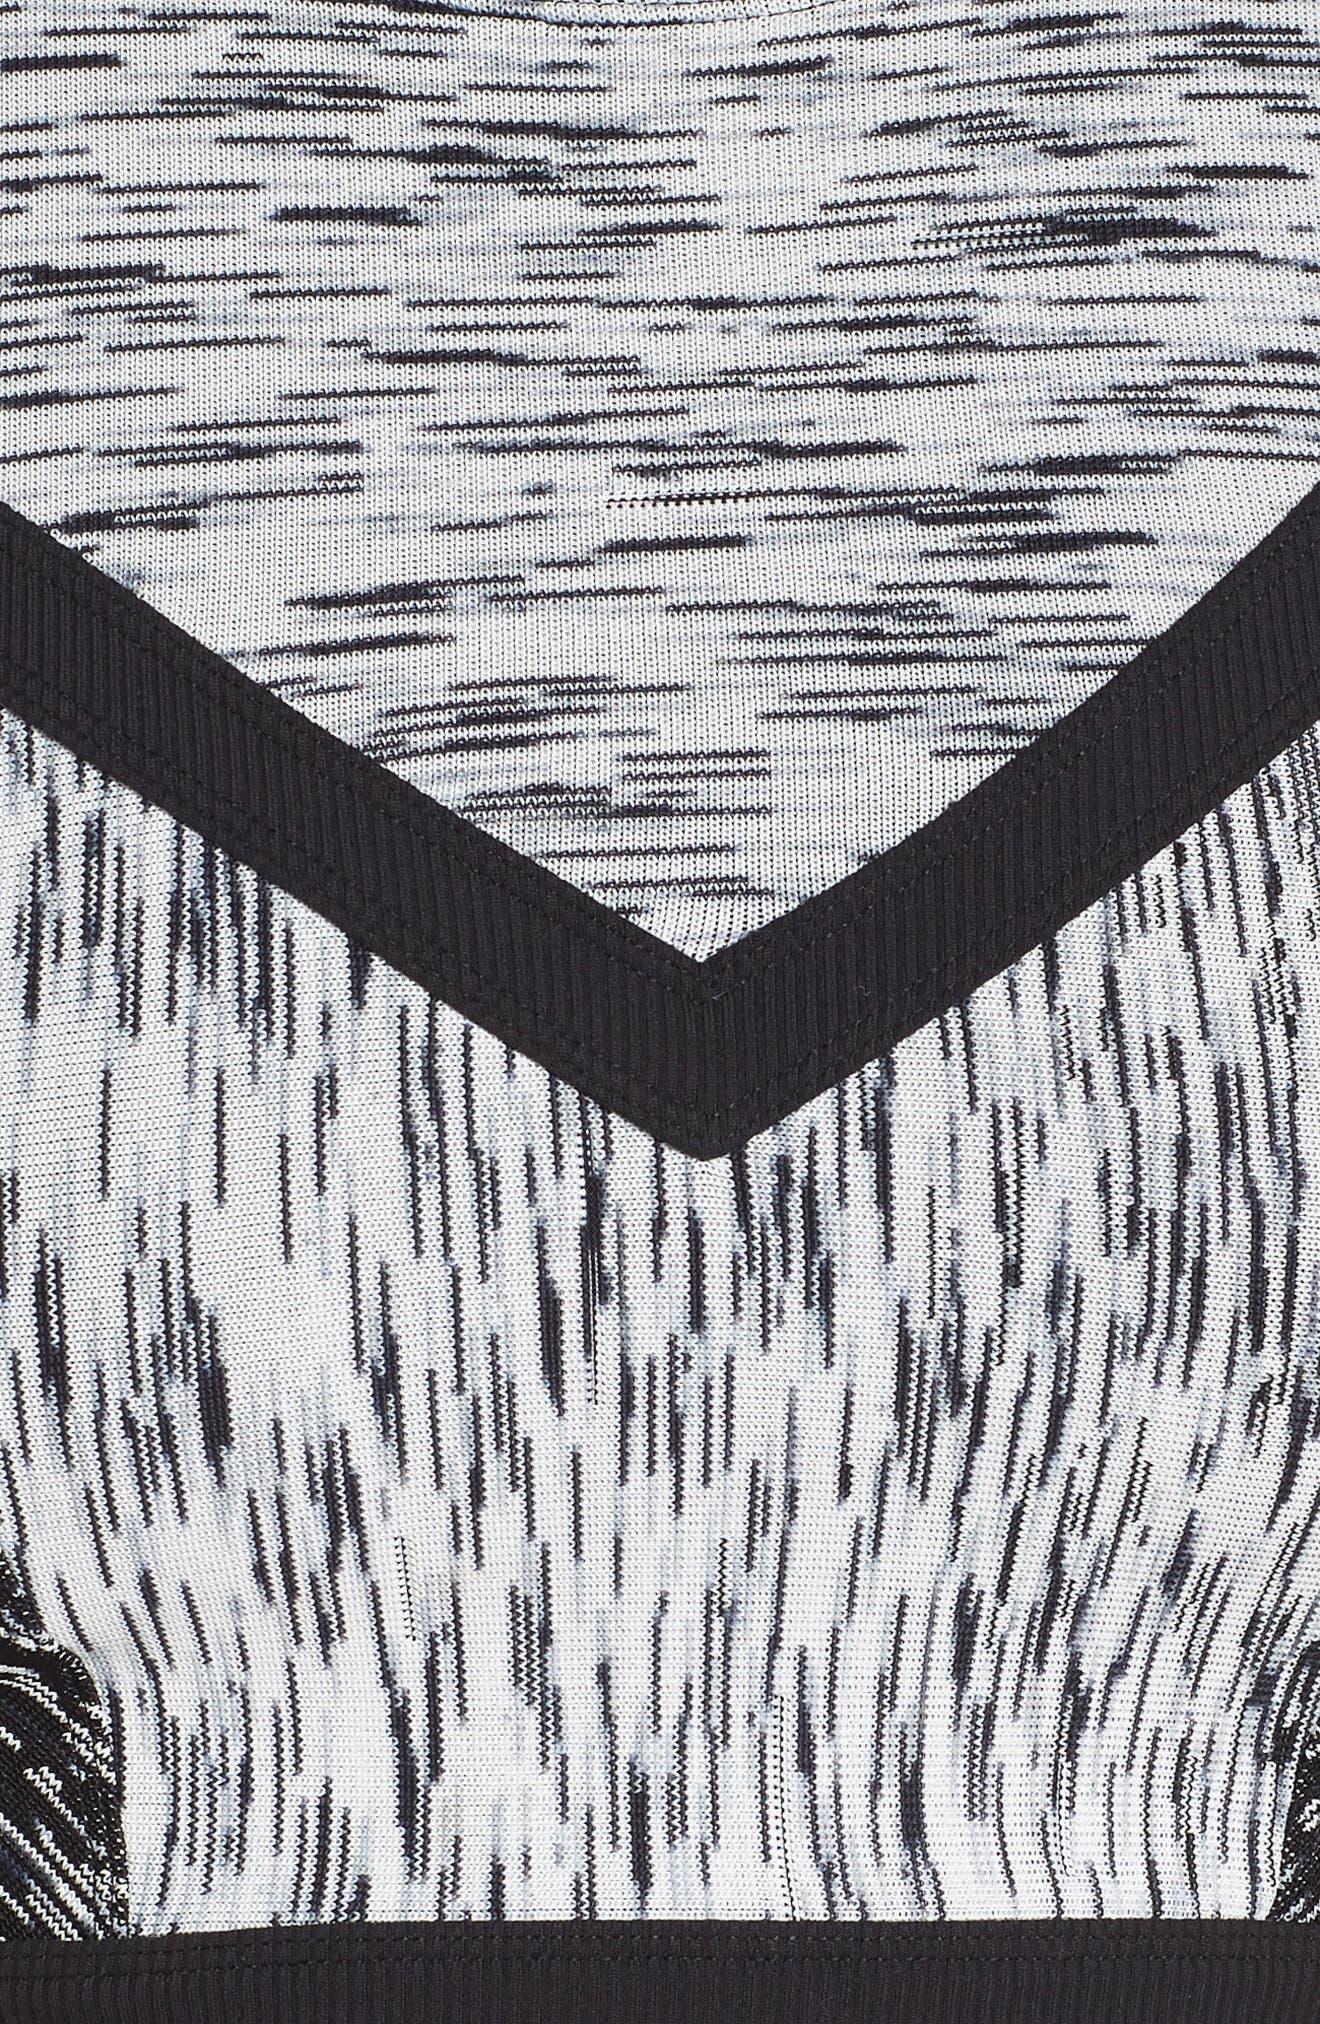 Static Sports Bra,                             Alternate thumbnail 6, color,                             BLACK ONYX